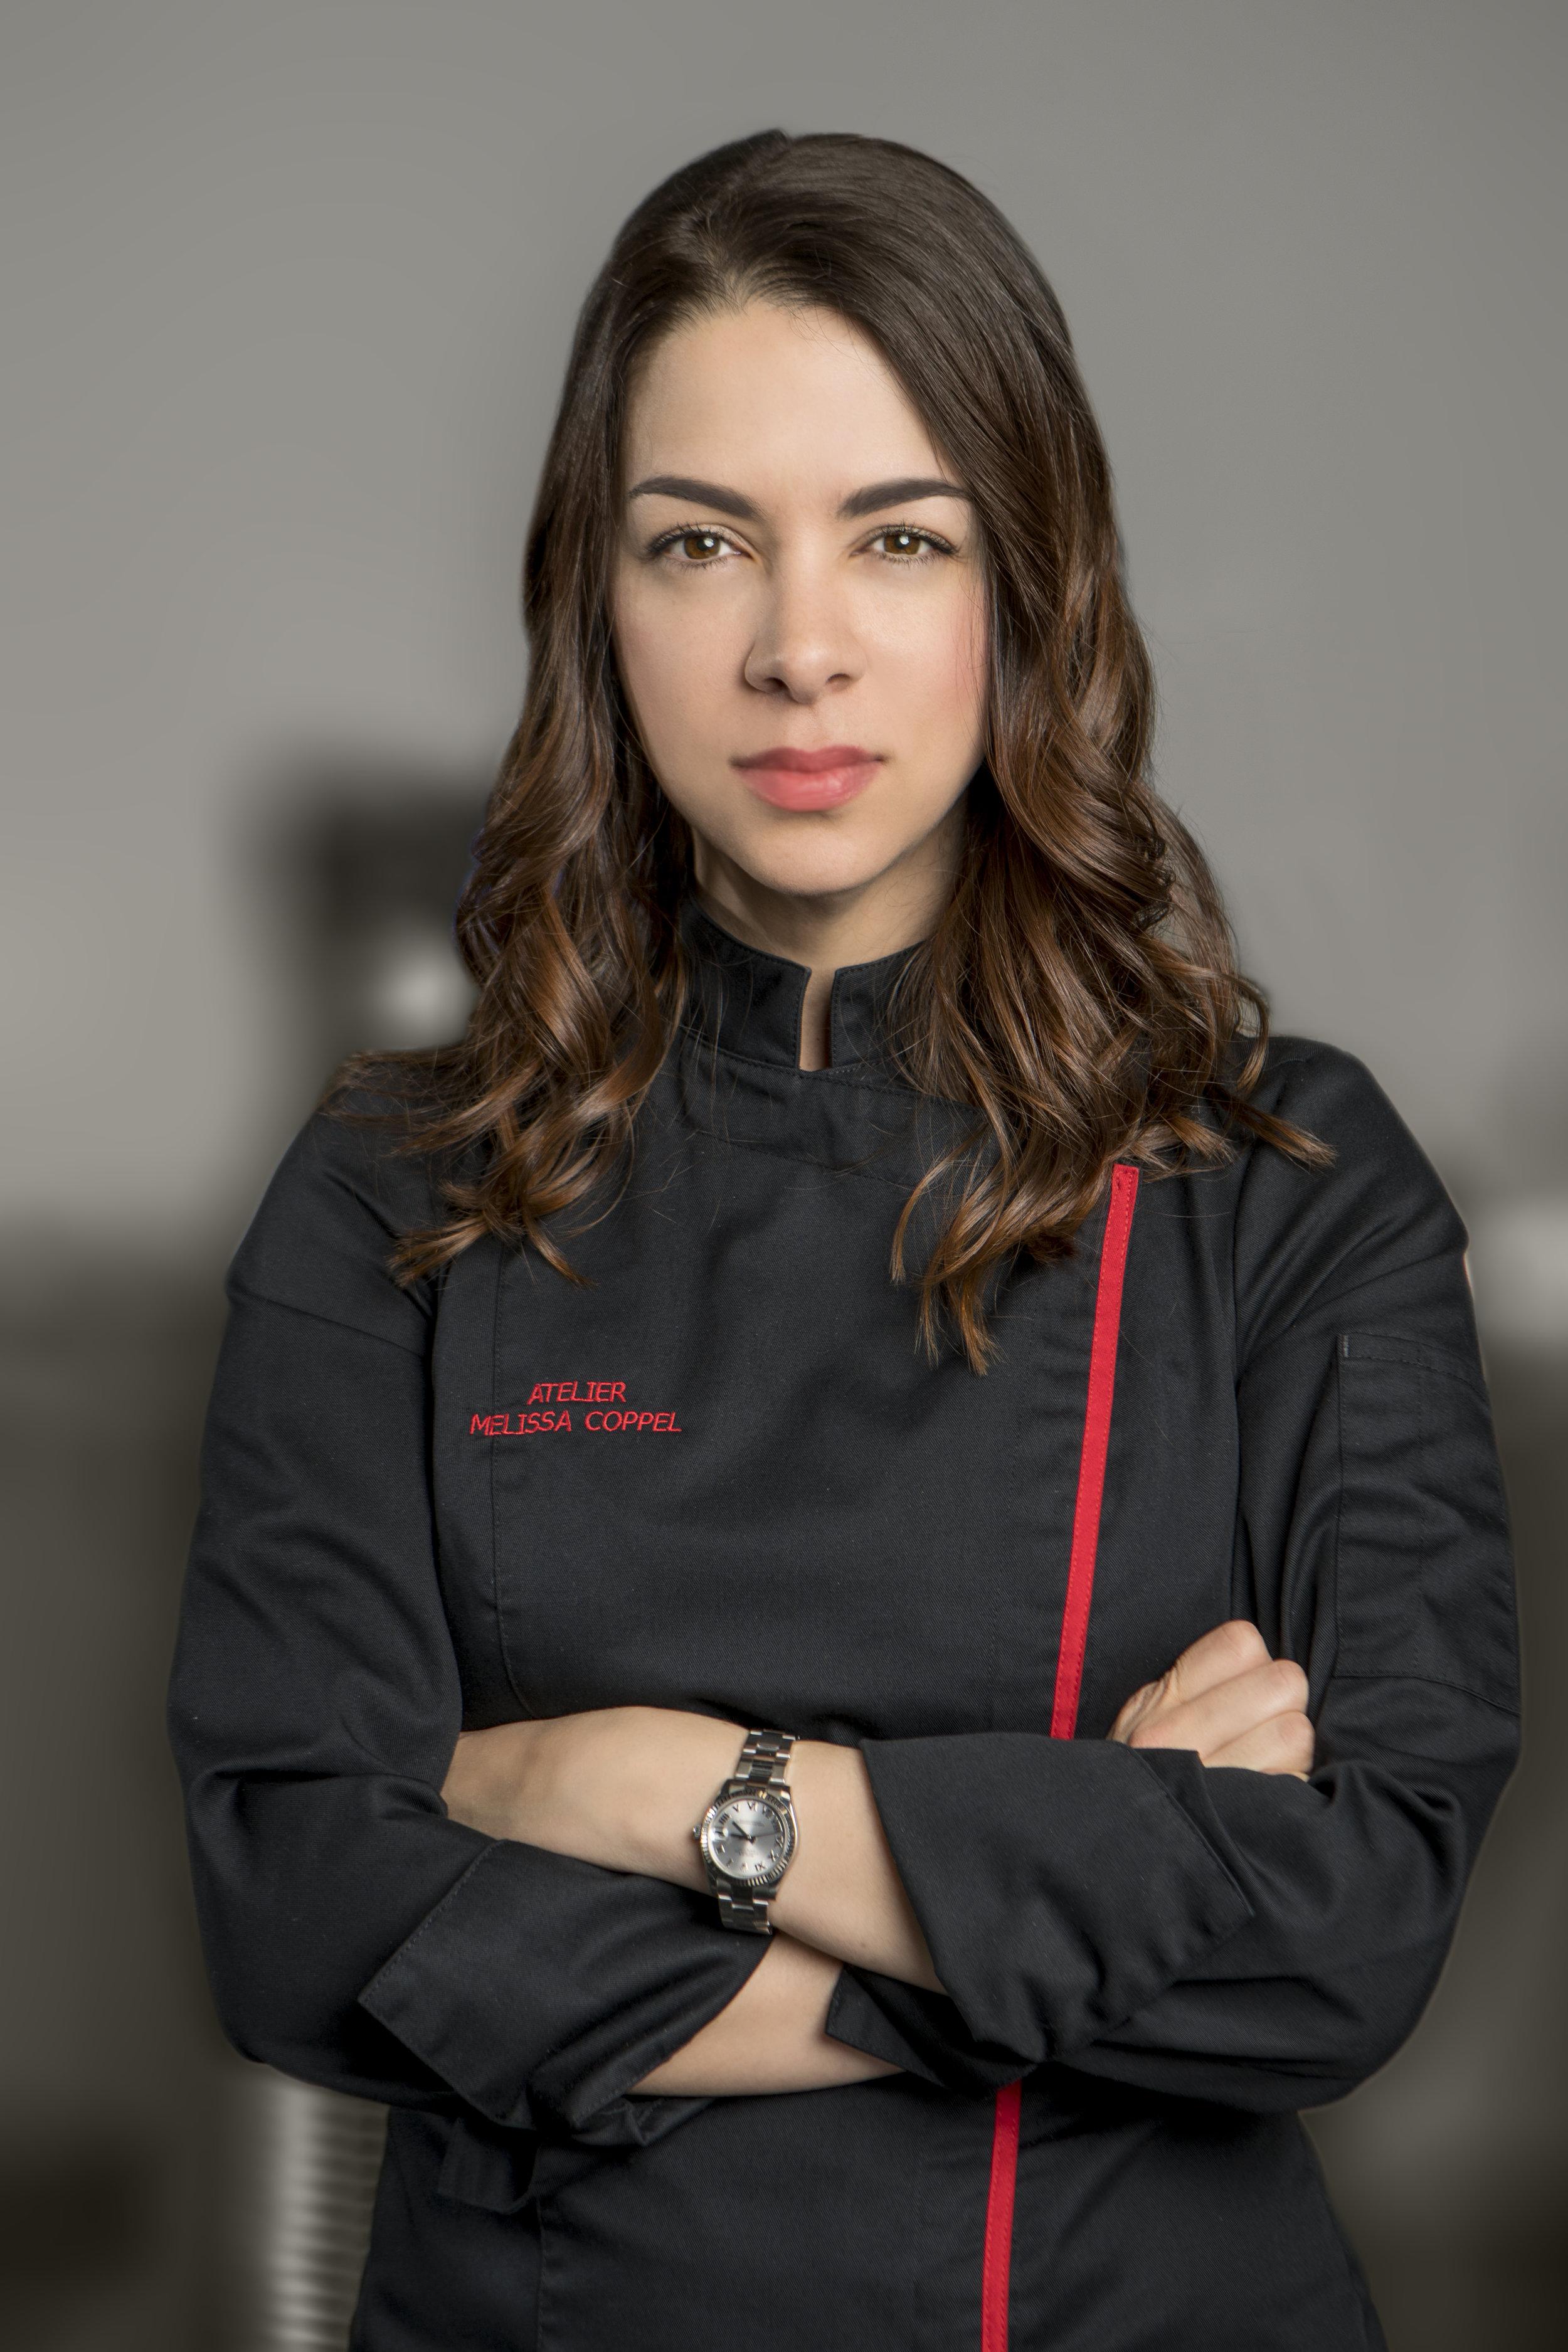 Melissa Coppel